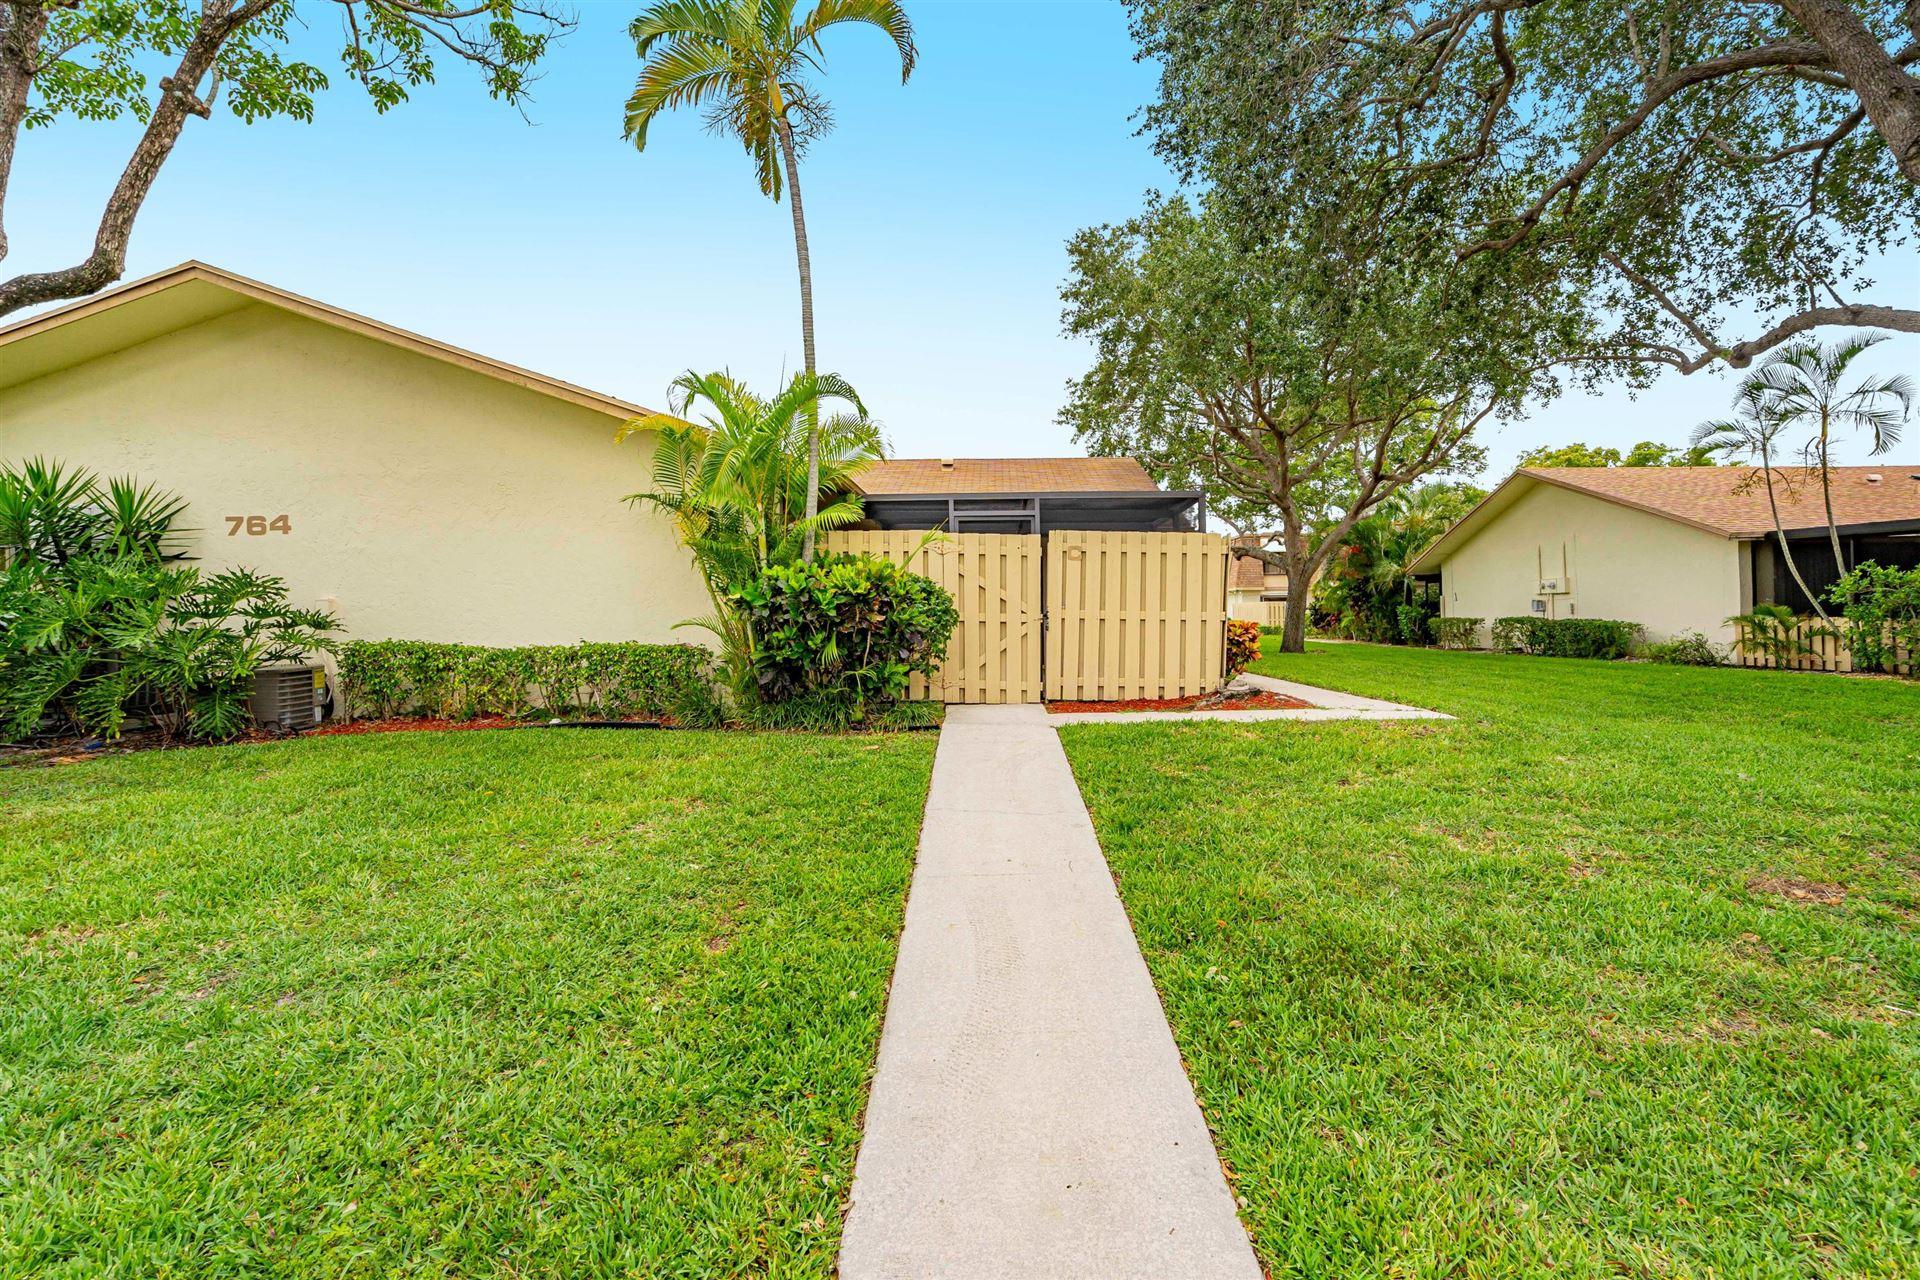 764 NW 29th Avenue #C, Delray Beach, FL 33445 - #: RX-10614933